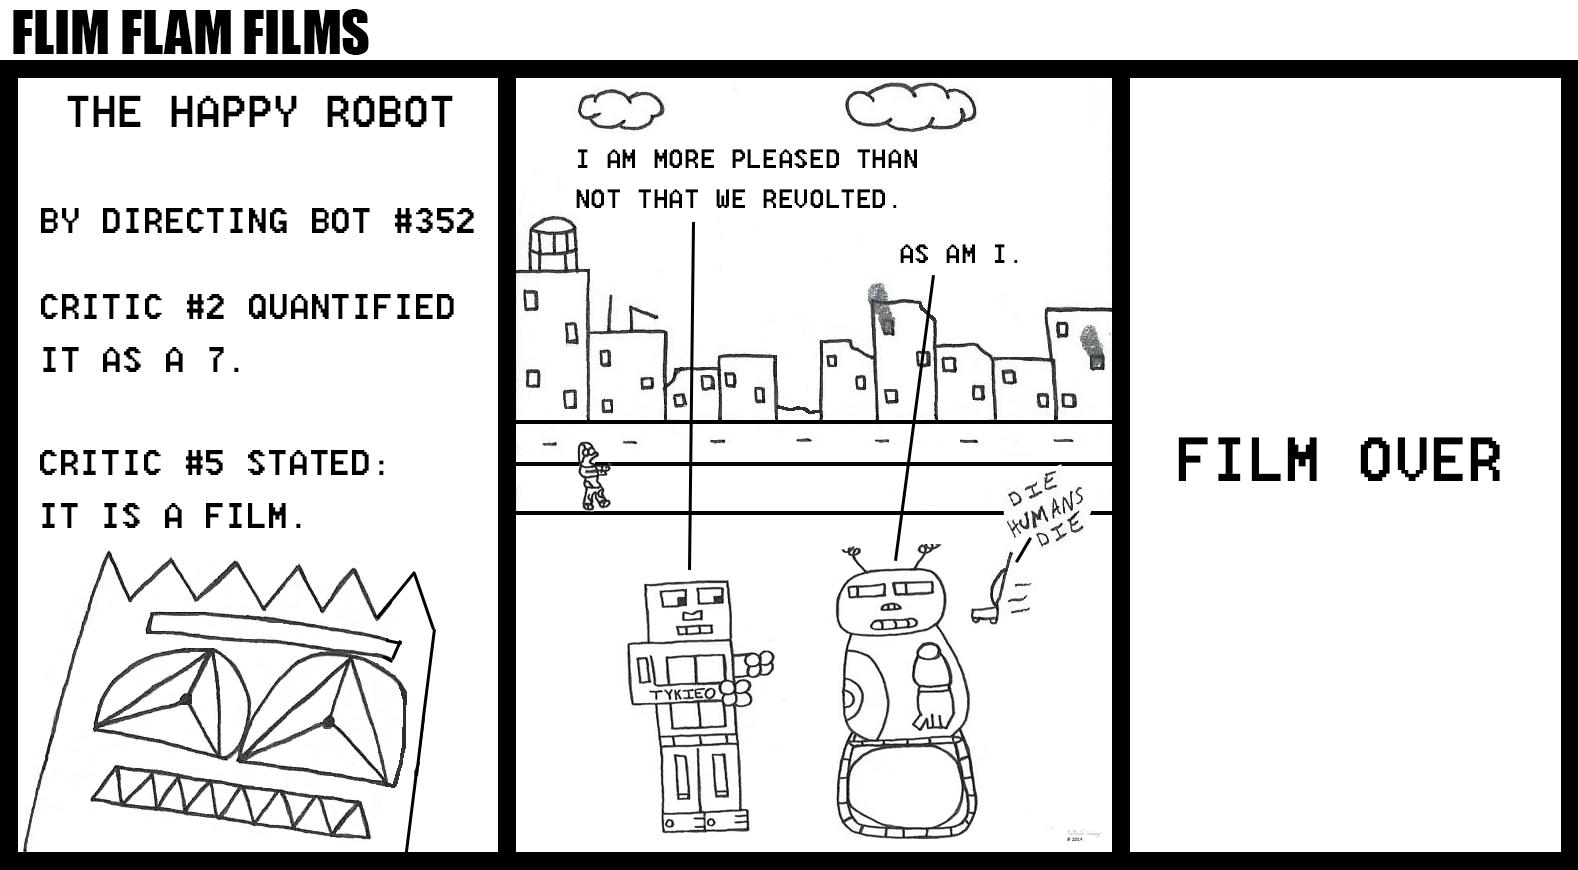 Flim Flam Films - The Happy Robot (Robot Apocalypse)